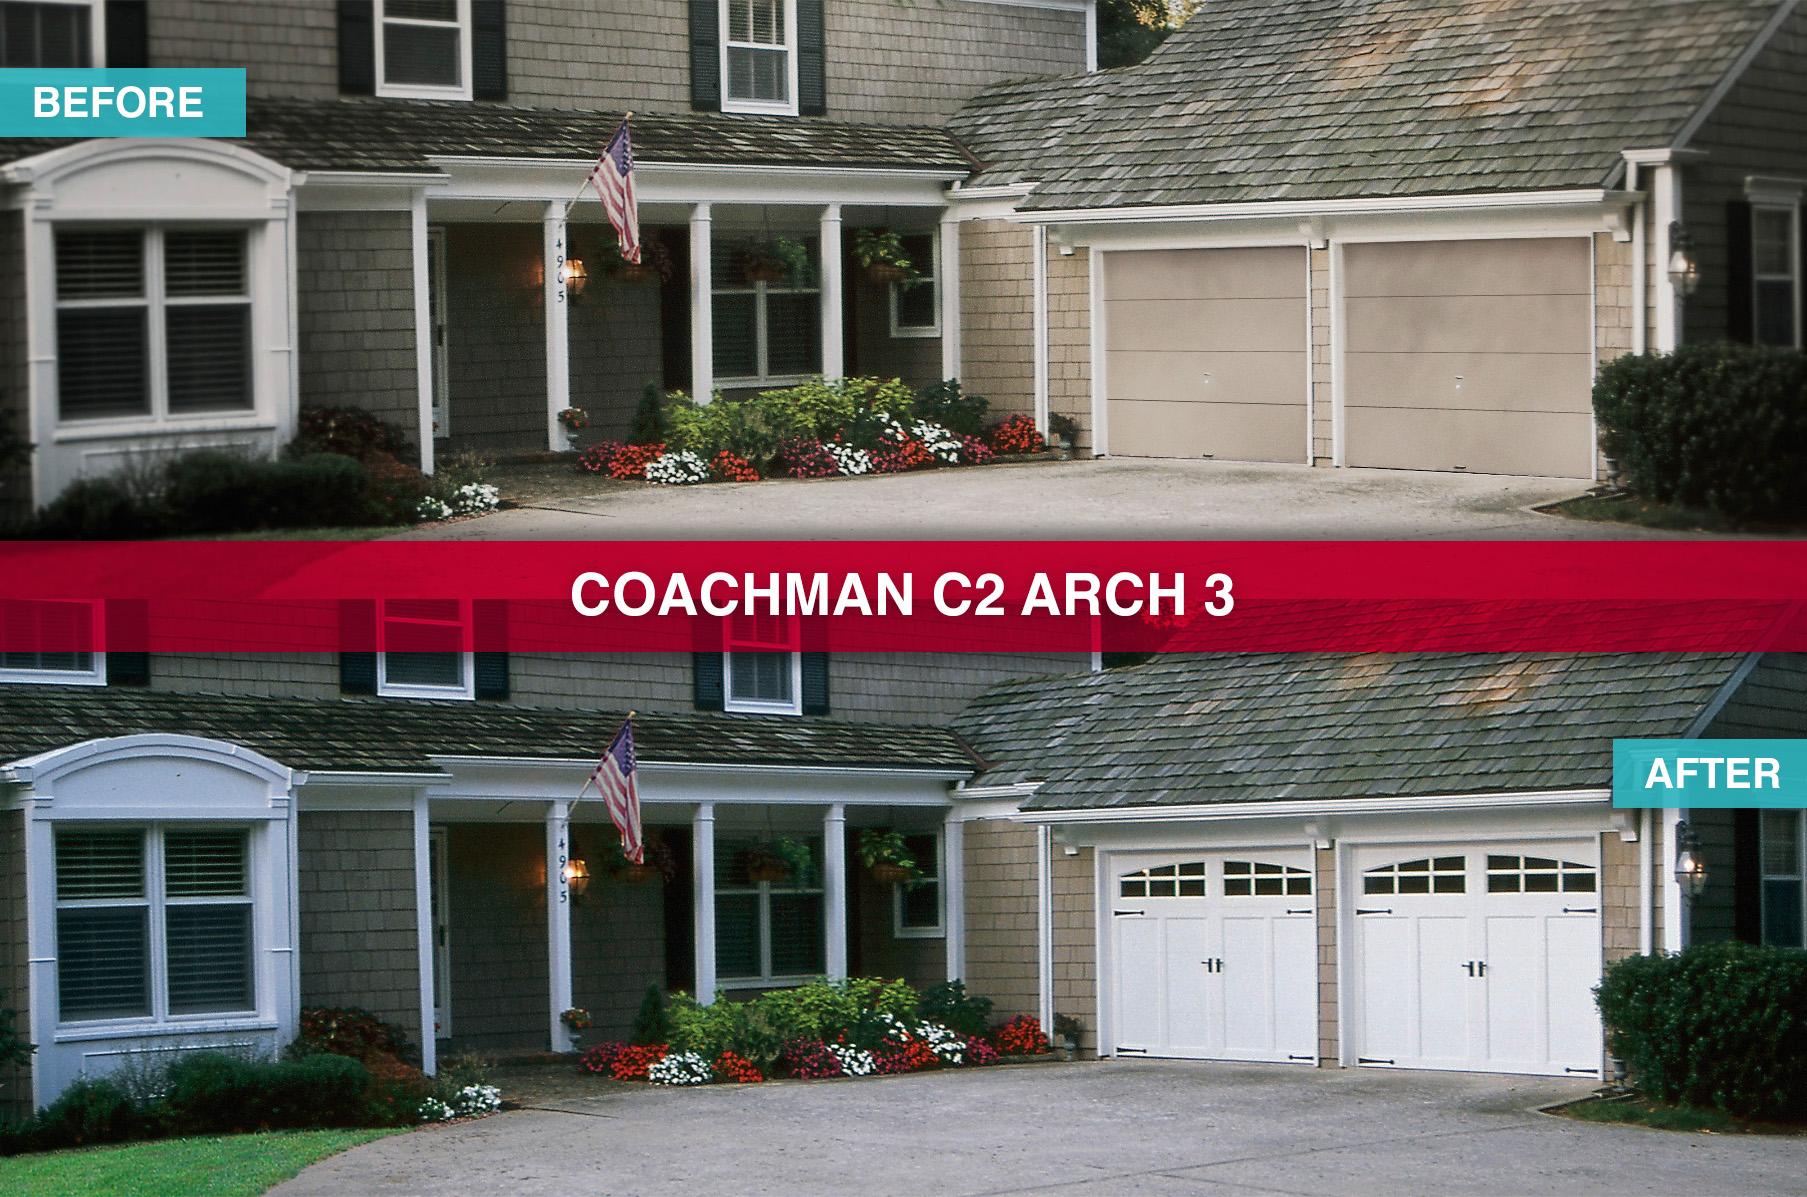 Coachman C2 Arch 3